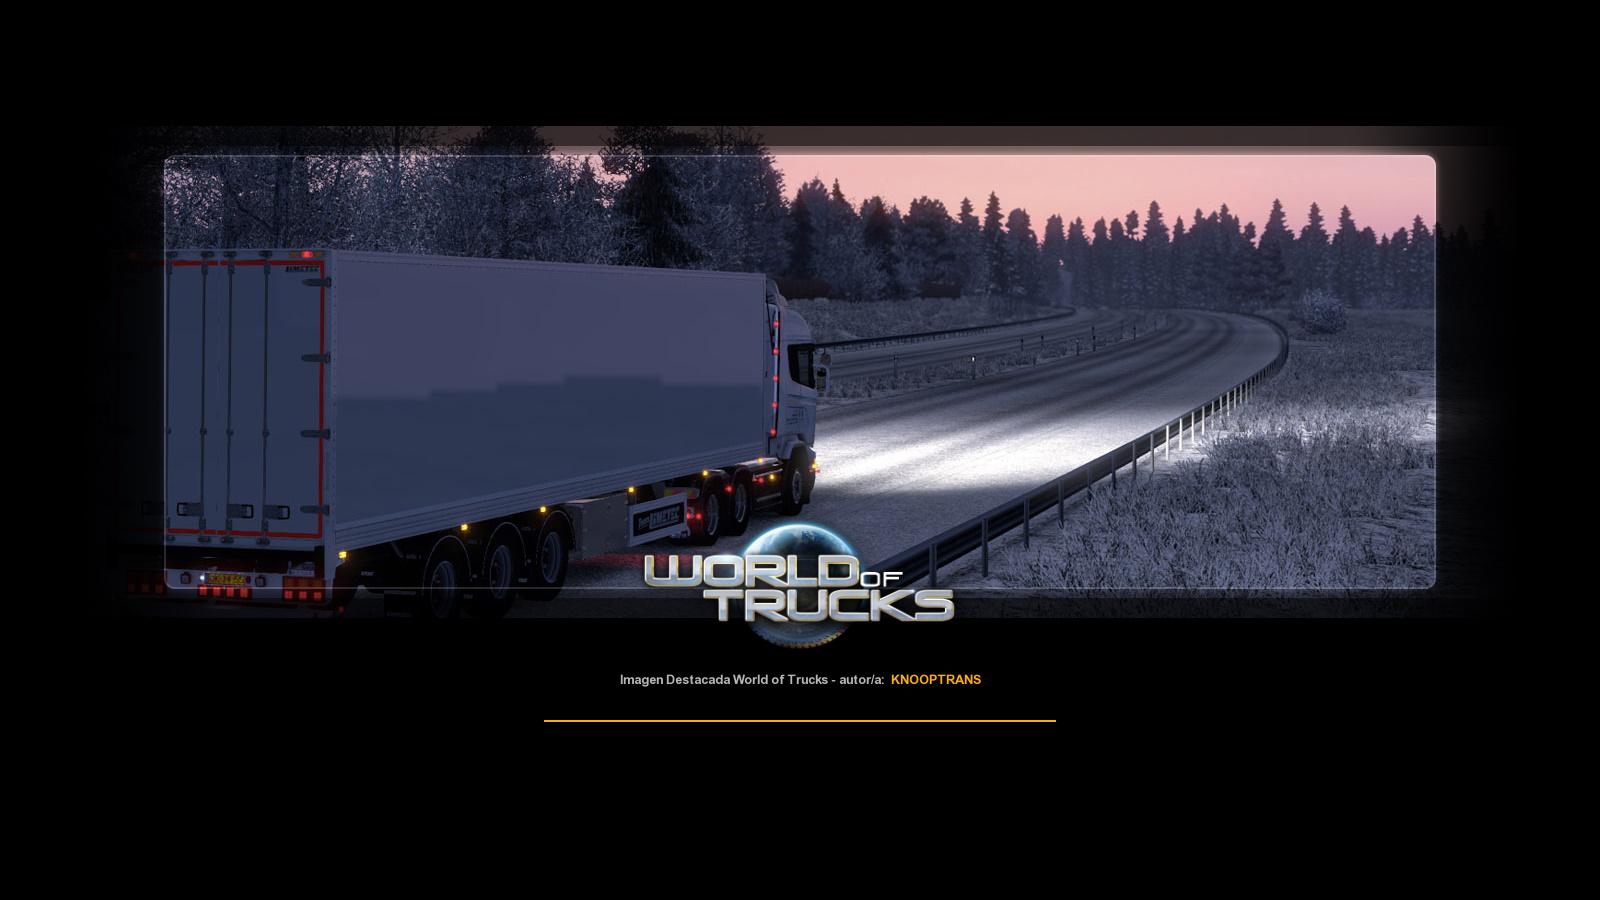 Lukaz_GT: Descargar E Instalar Euro Truck Simulator 2 Full Español Ultima Versión v1.26.2.2 + 47 DLC